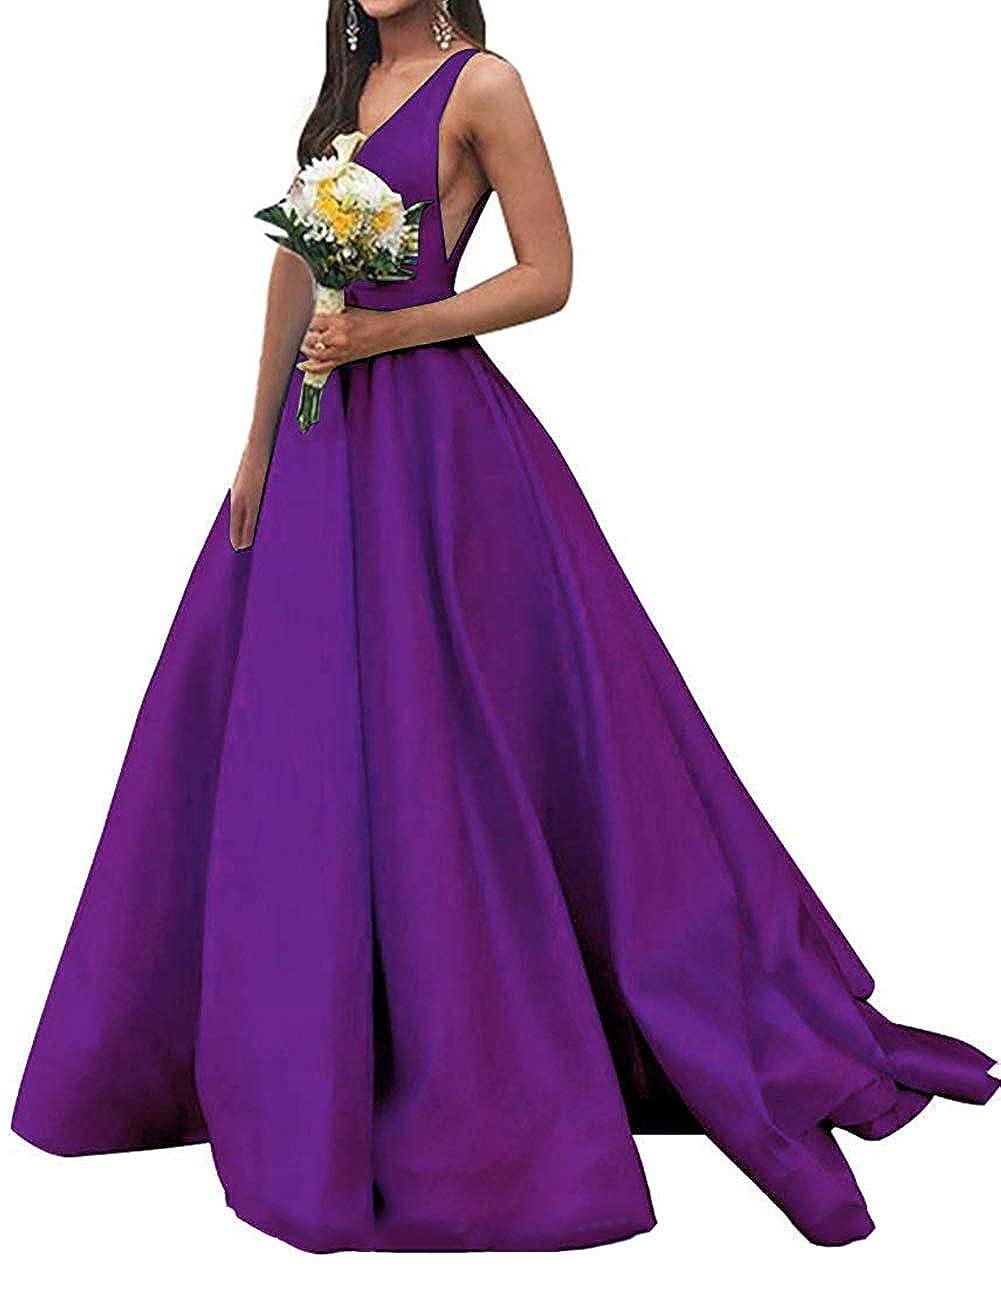 Grape JAEDEN Prom Dresses Formal Evening Gowns Long Evening Dresses V Neck Satin Prom Gowns Sleeveless